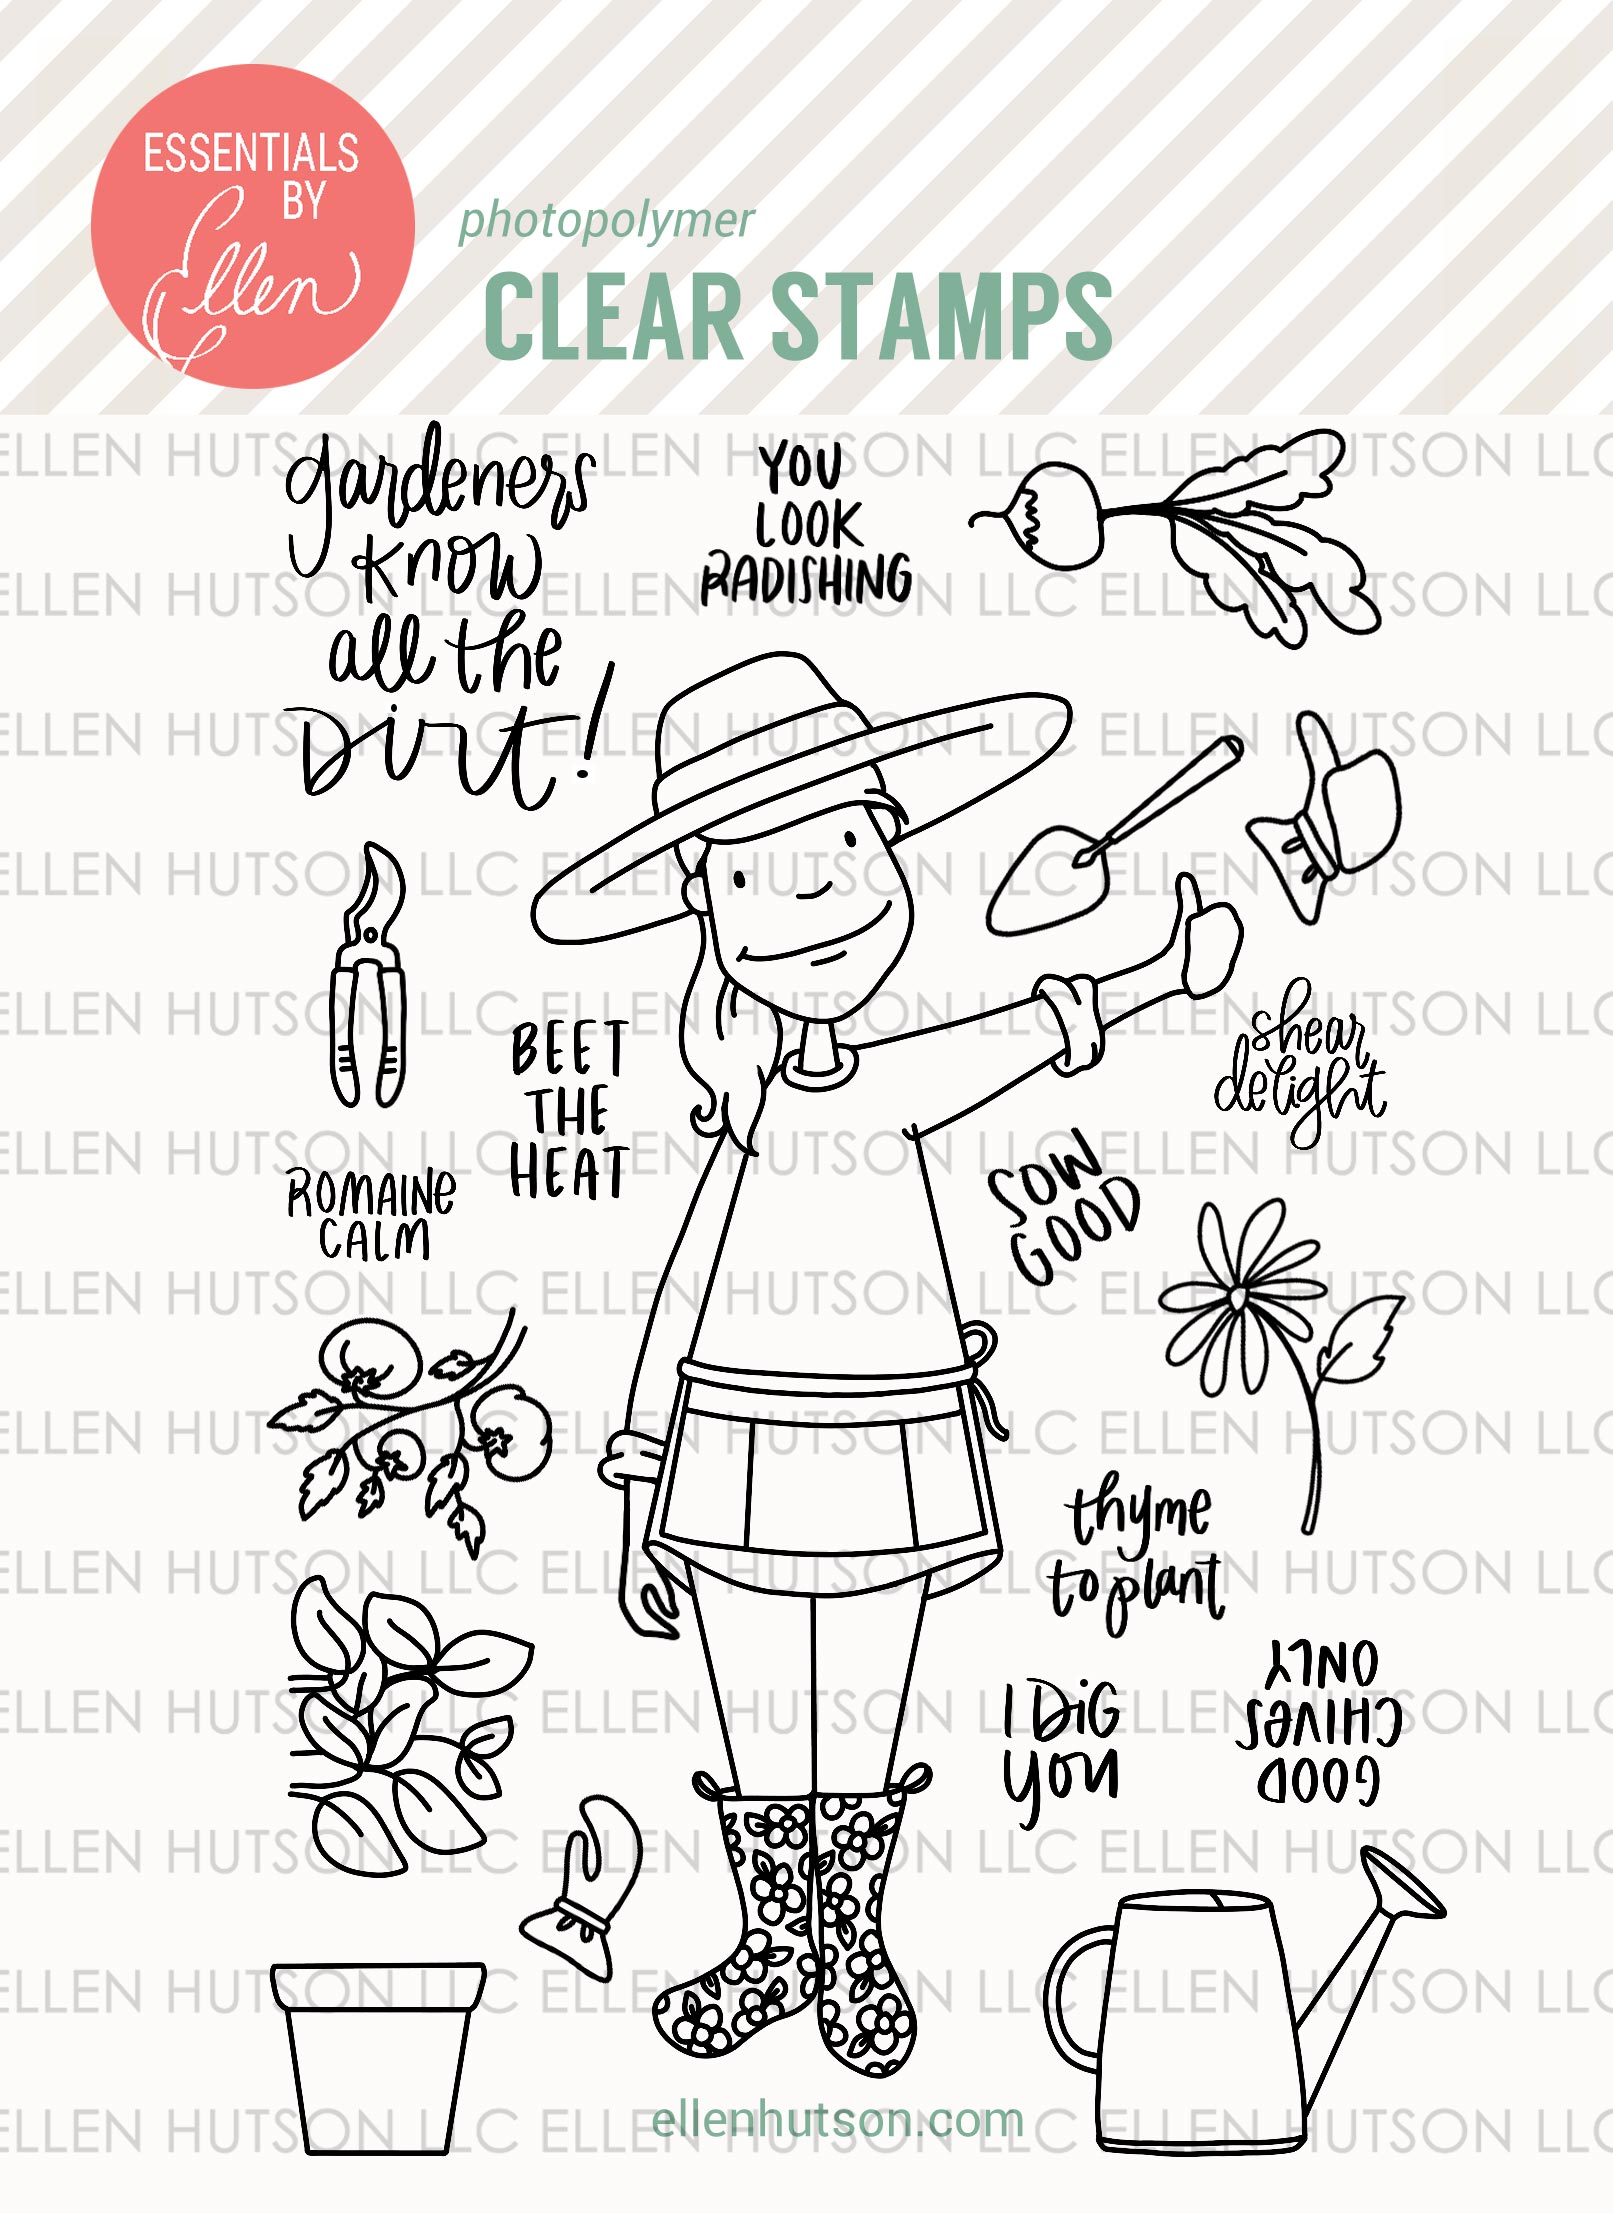 ebe-201708-stamps-leading-ladies-plant-fw50.jpg